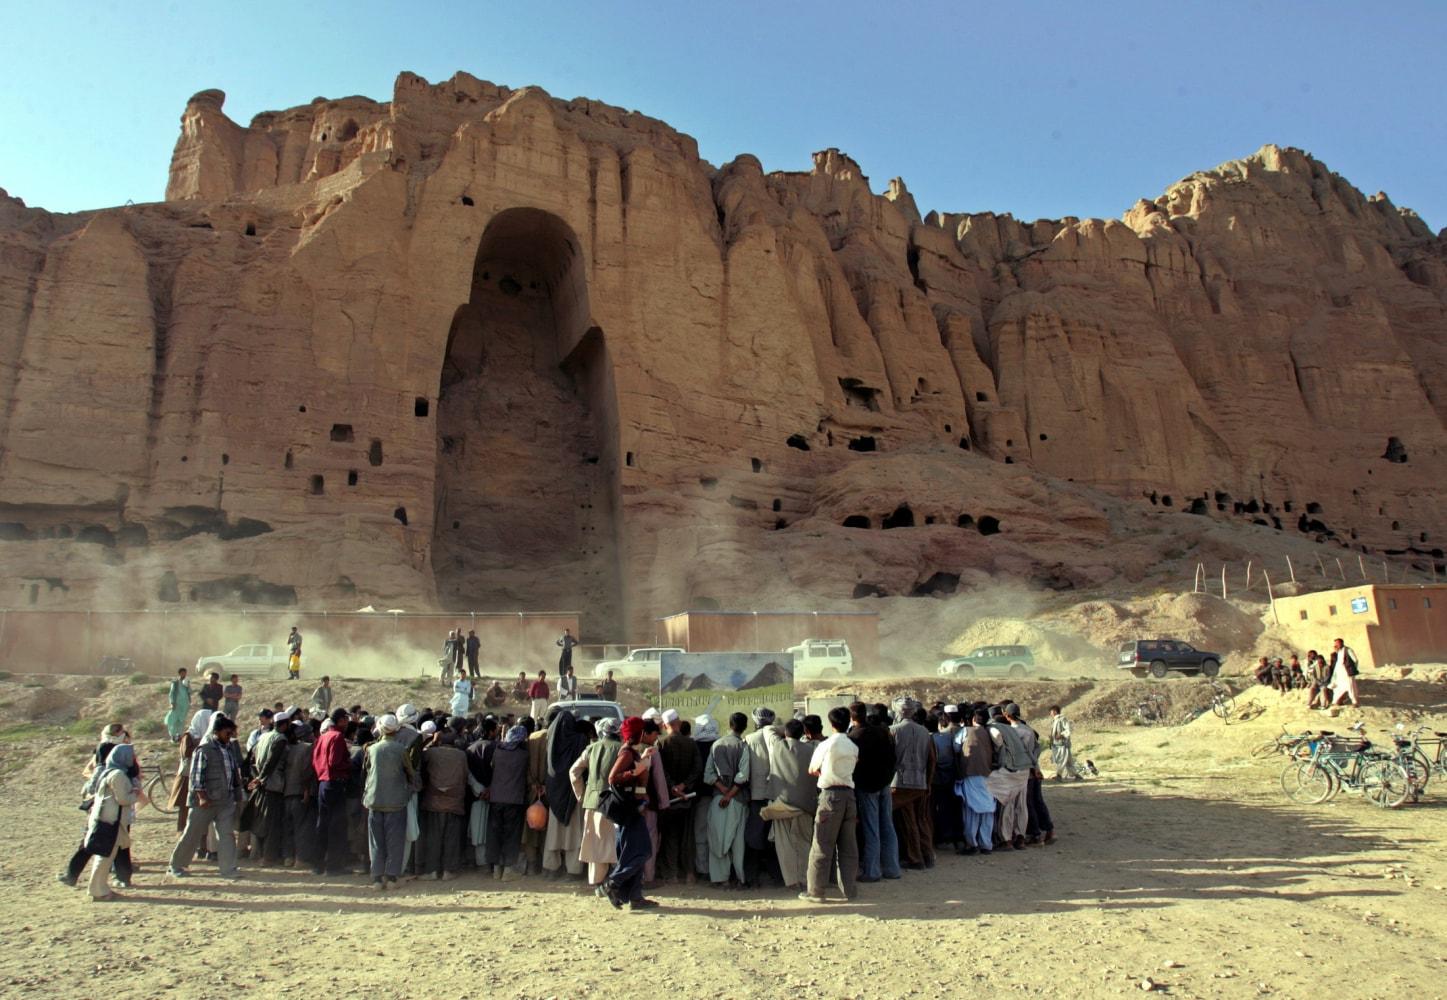 Rocket Hits Van Carrying American Tourists In Herat Afghanistan